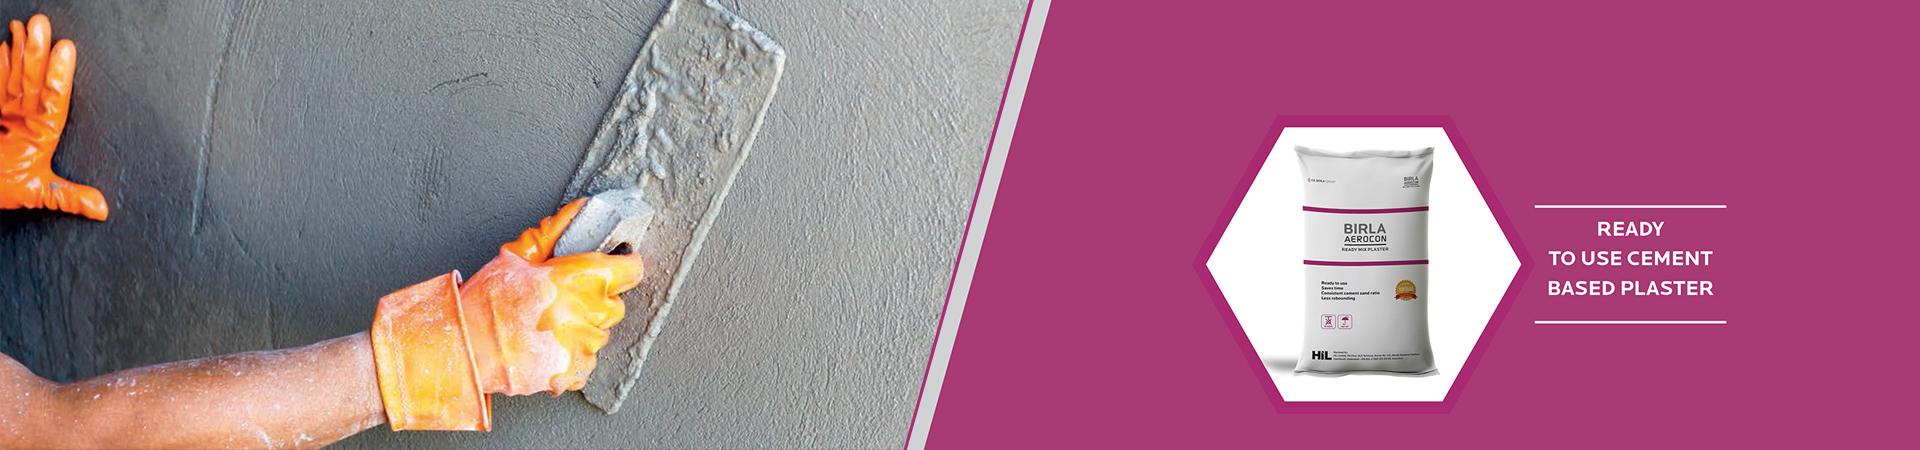 Birla Aerocon ready mix plaster